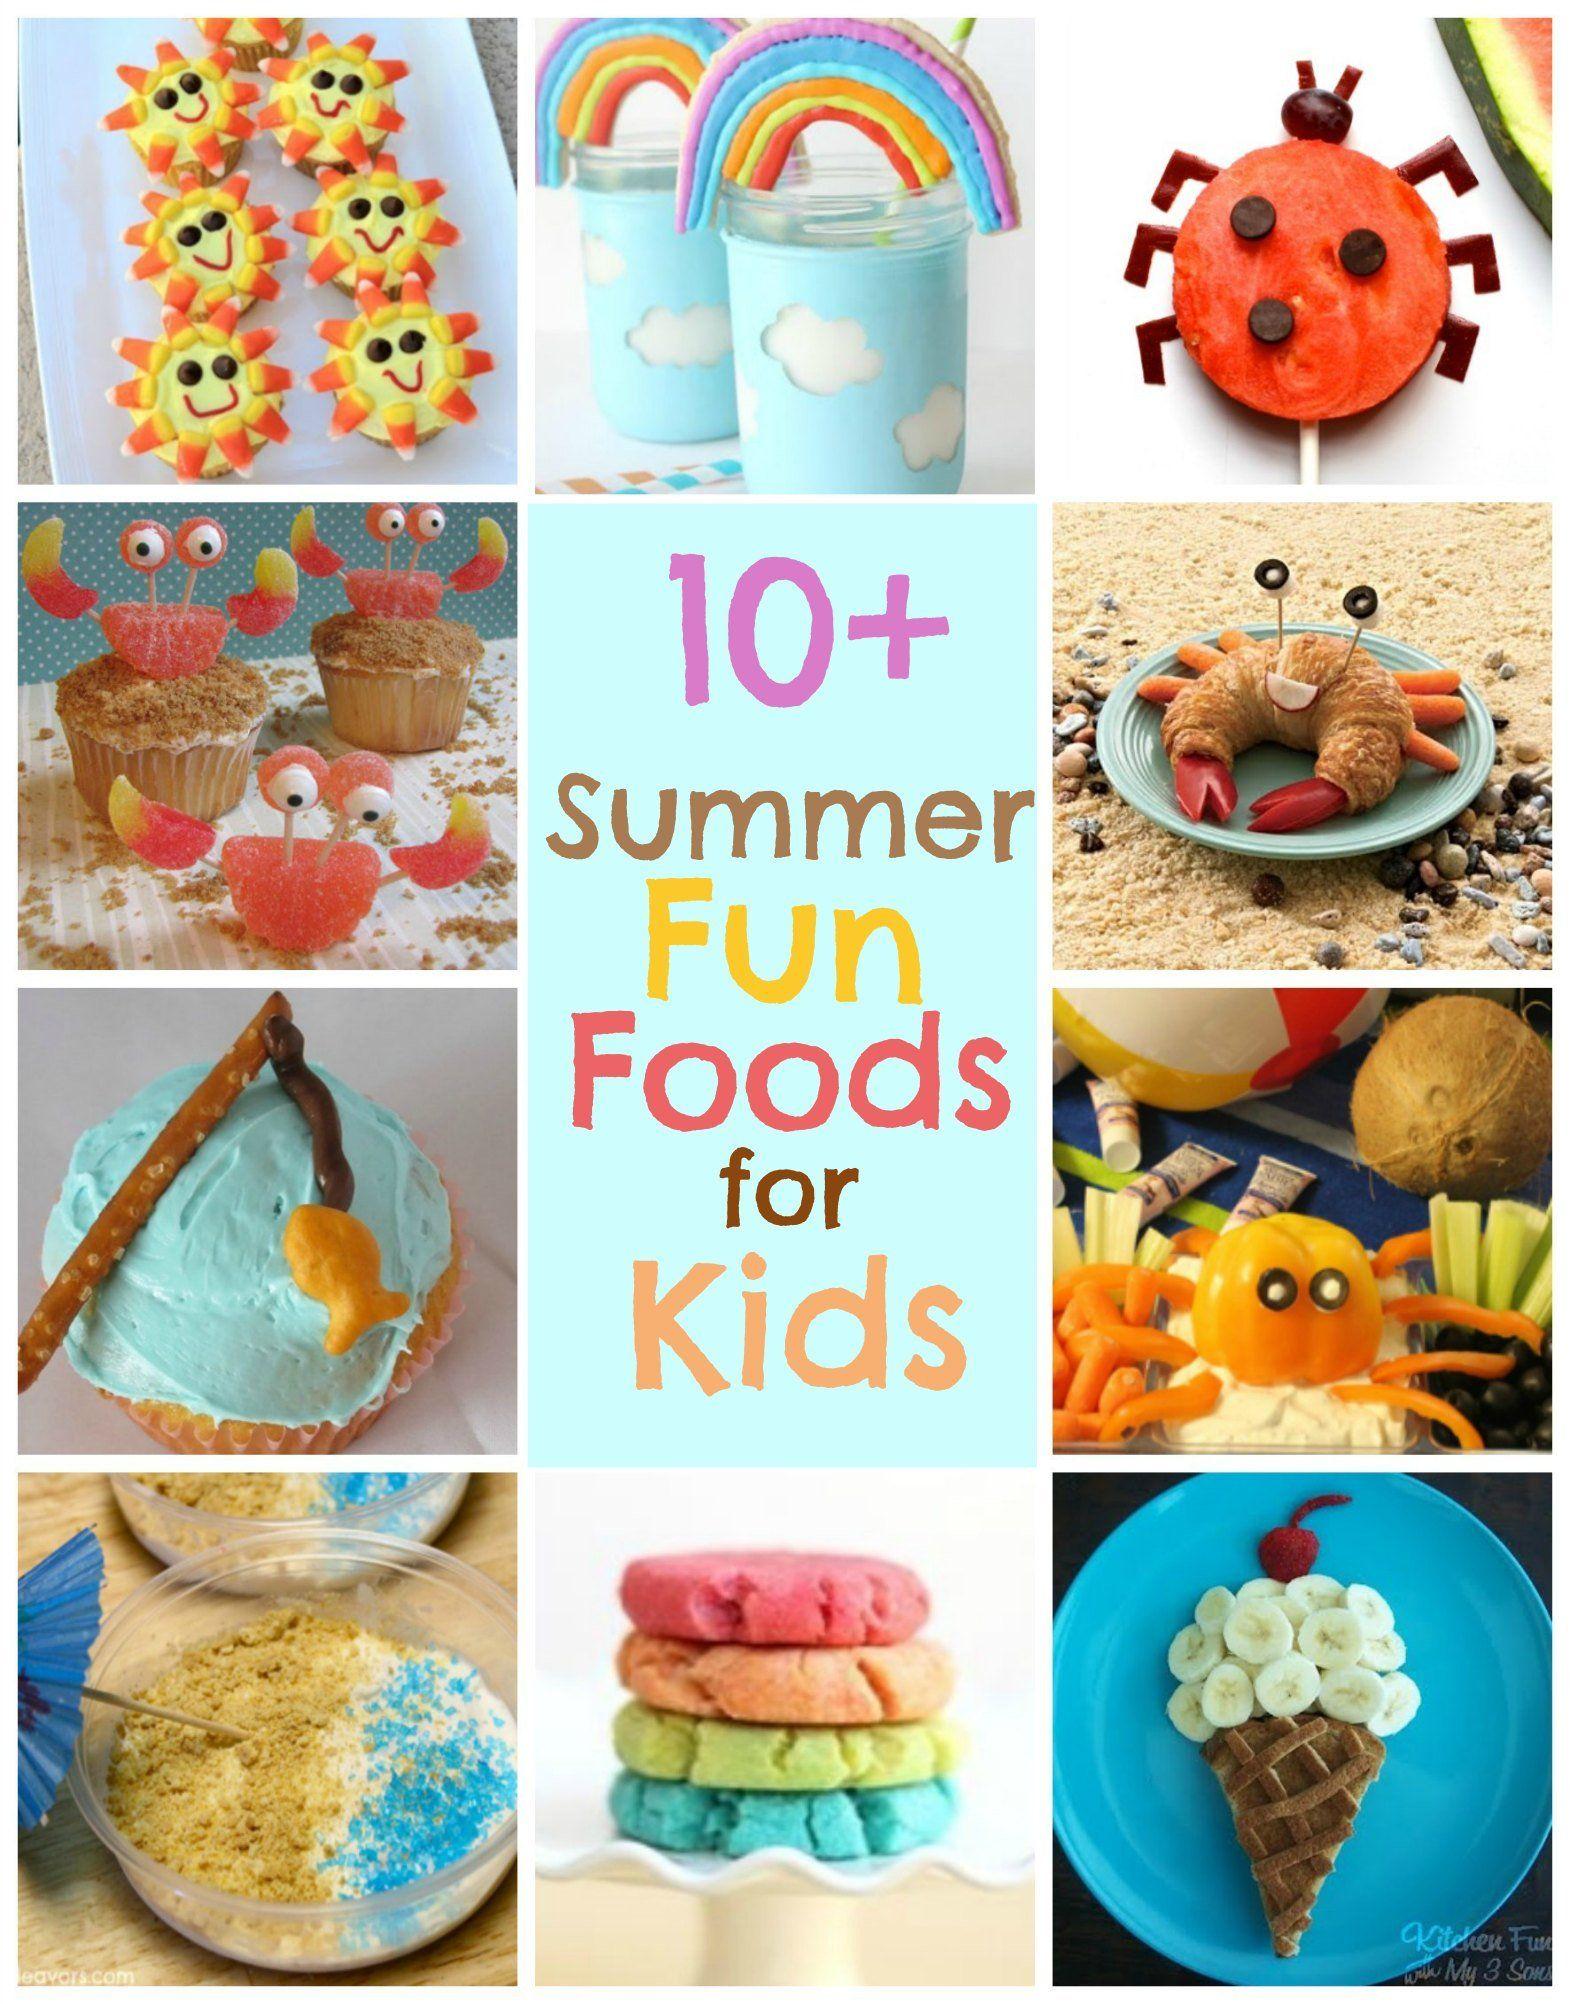 Summer Fun Foods For Kids 1 570 2 004 Pixels